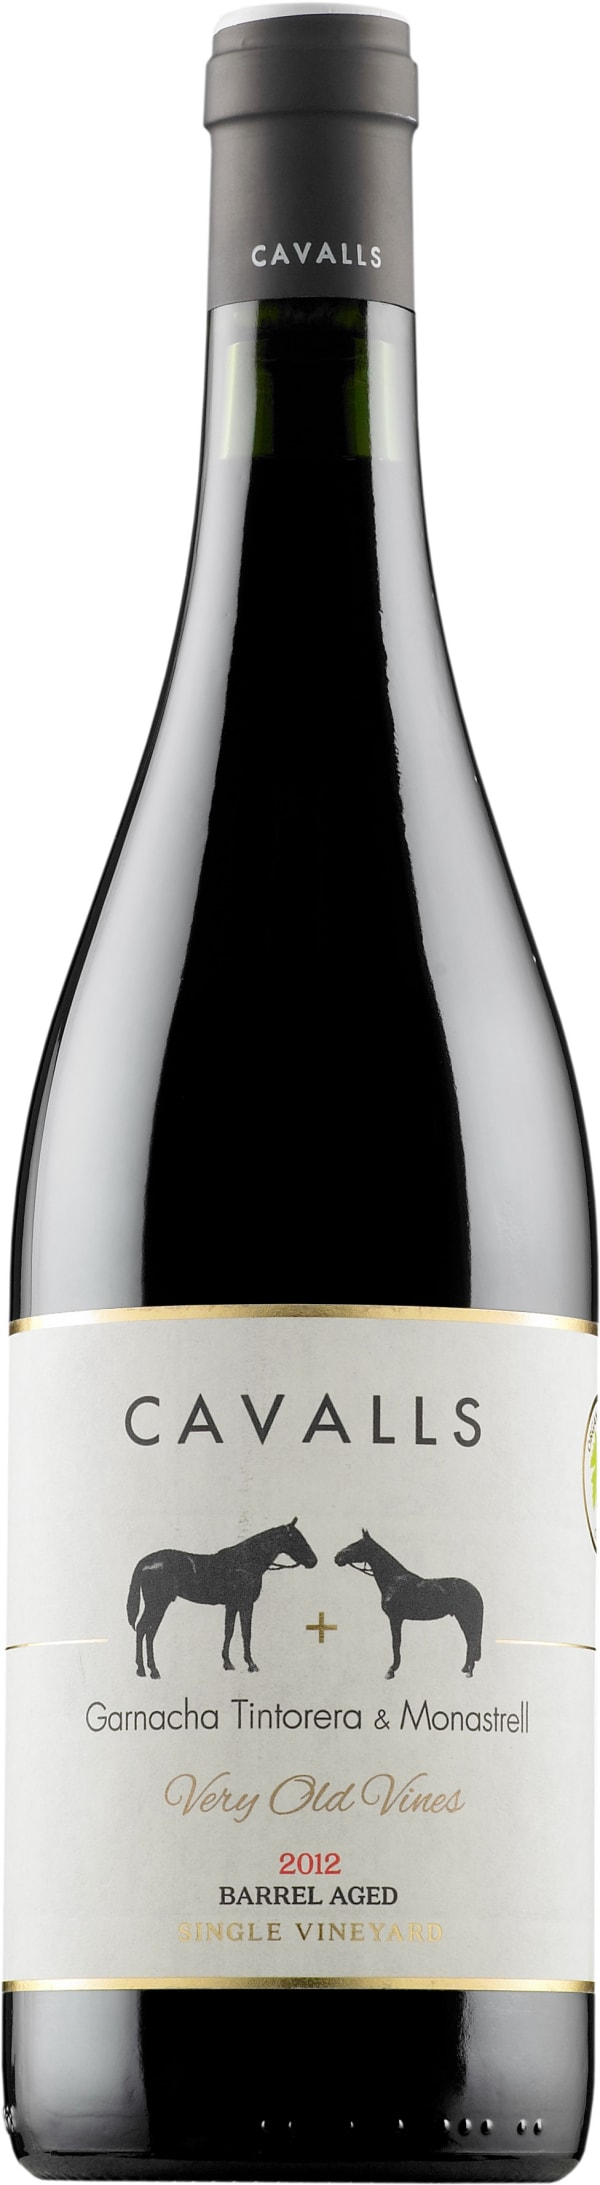 Cavalls Garnacha Tintorera & Monastrell Very Old Vines 2013